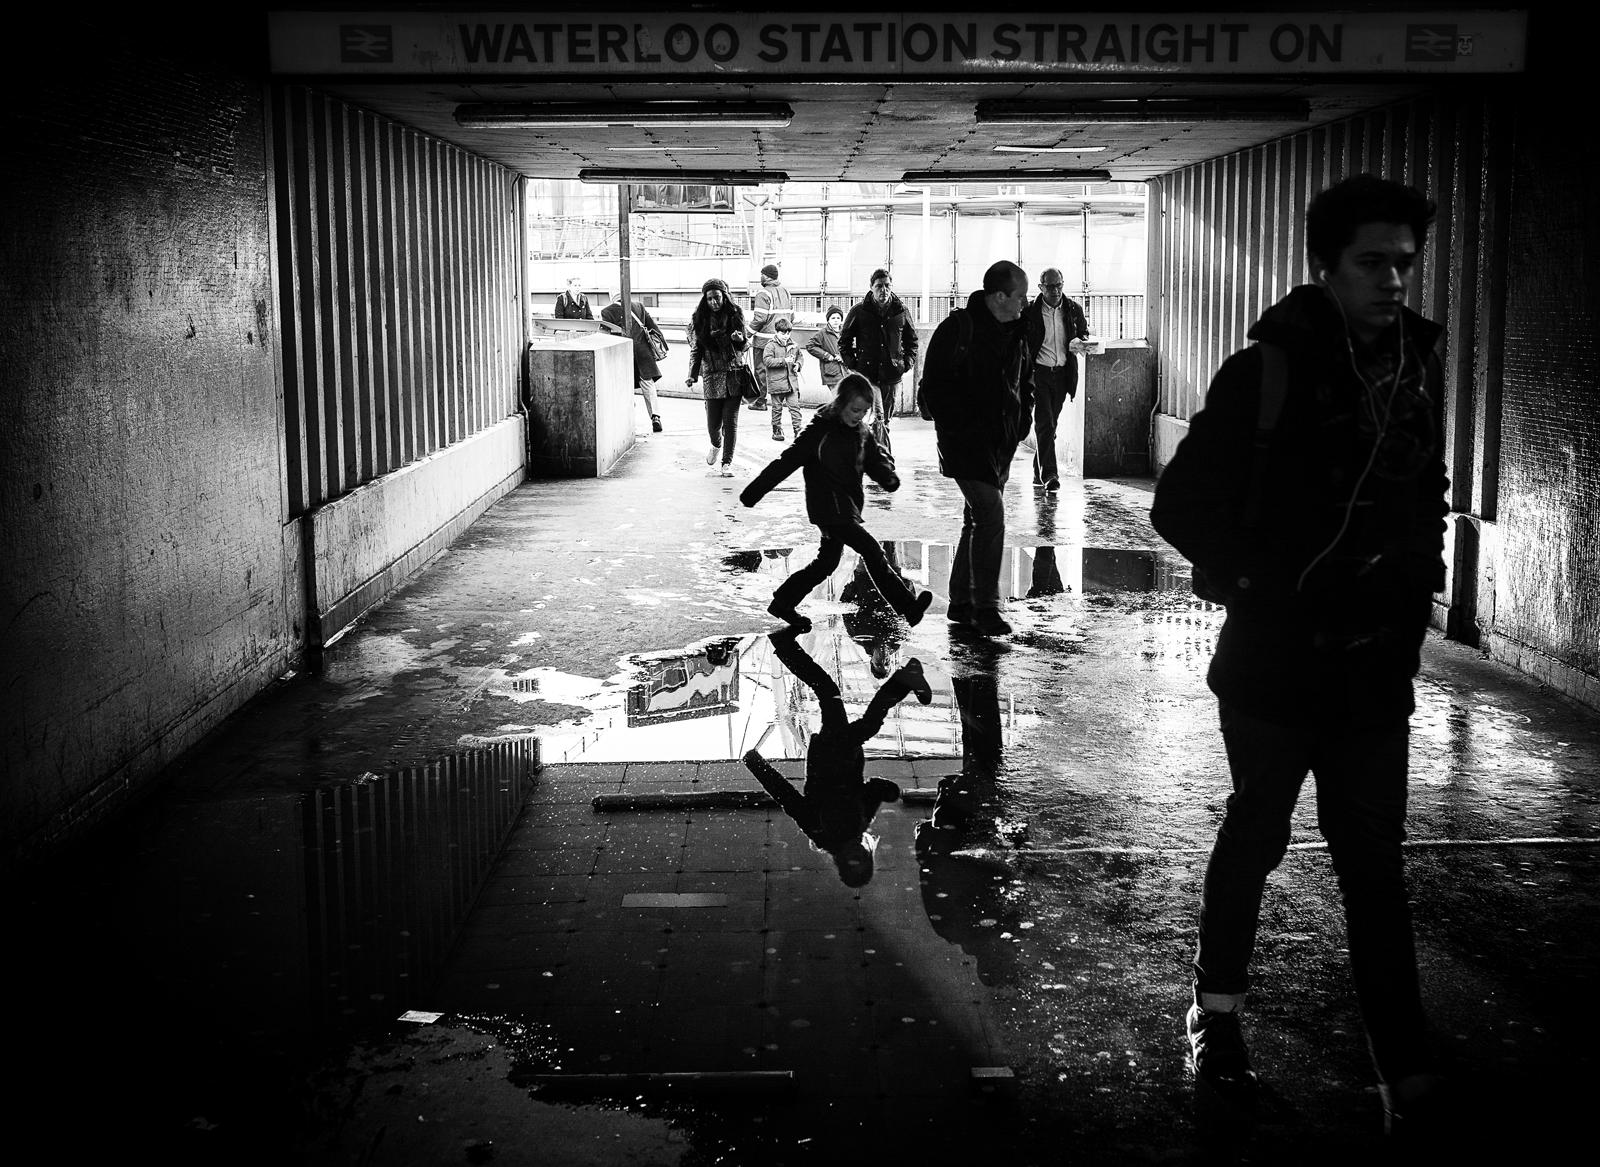 Wallpaper Street Leica City White Black London Girl Station Puddle Photography Jump Jumping Waterloo Monochrom Reallife Michaeltoye Michaelwalkertoye 1600x1167 945311 Hd Wallpapers Wallhere